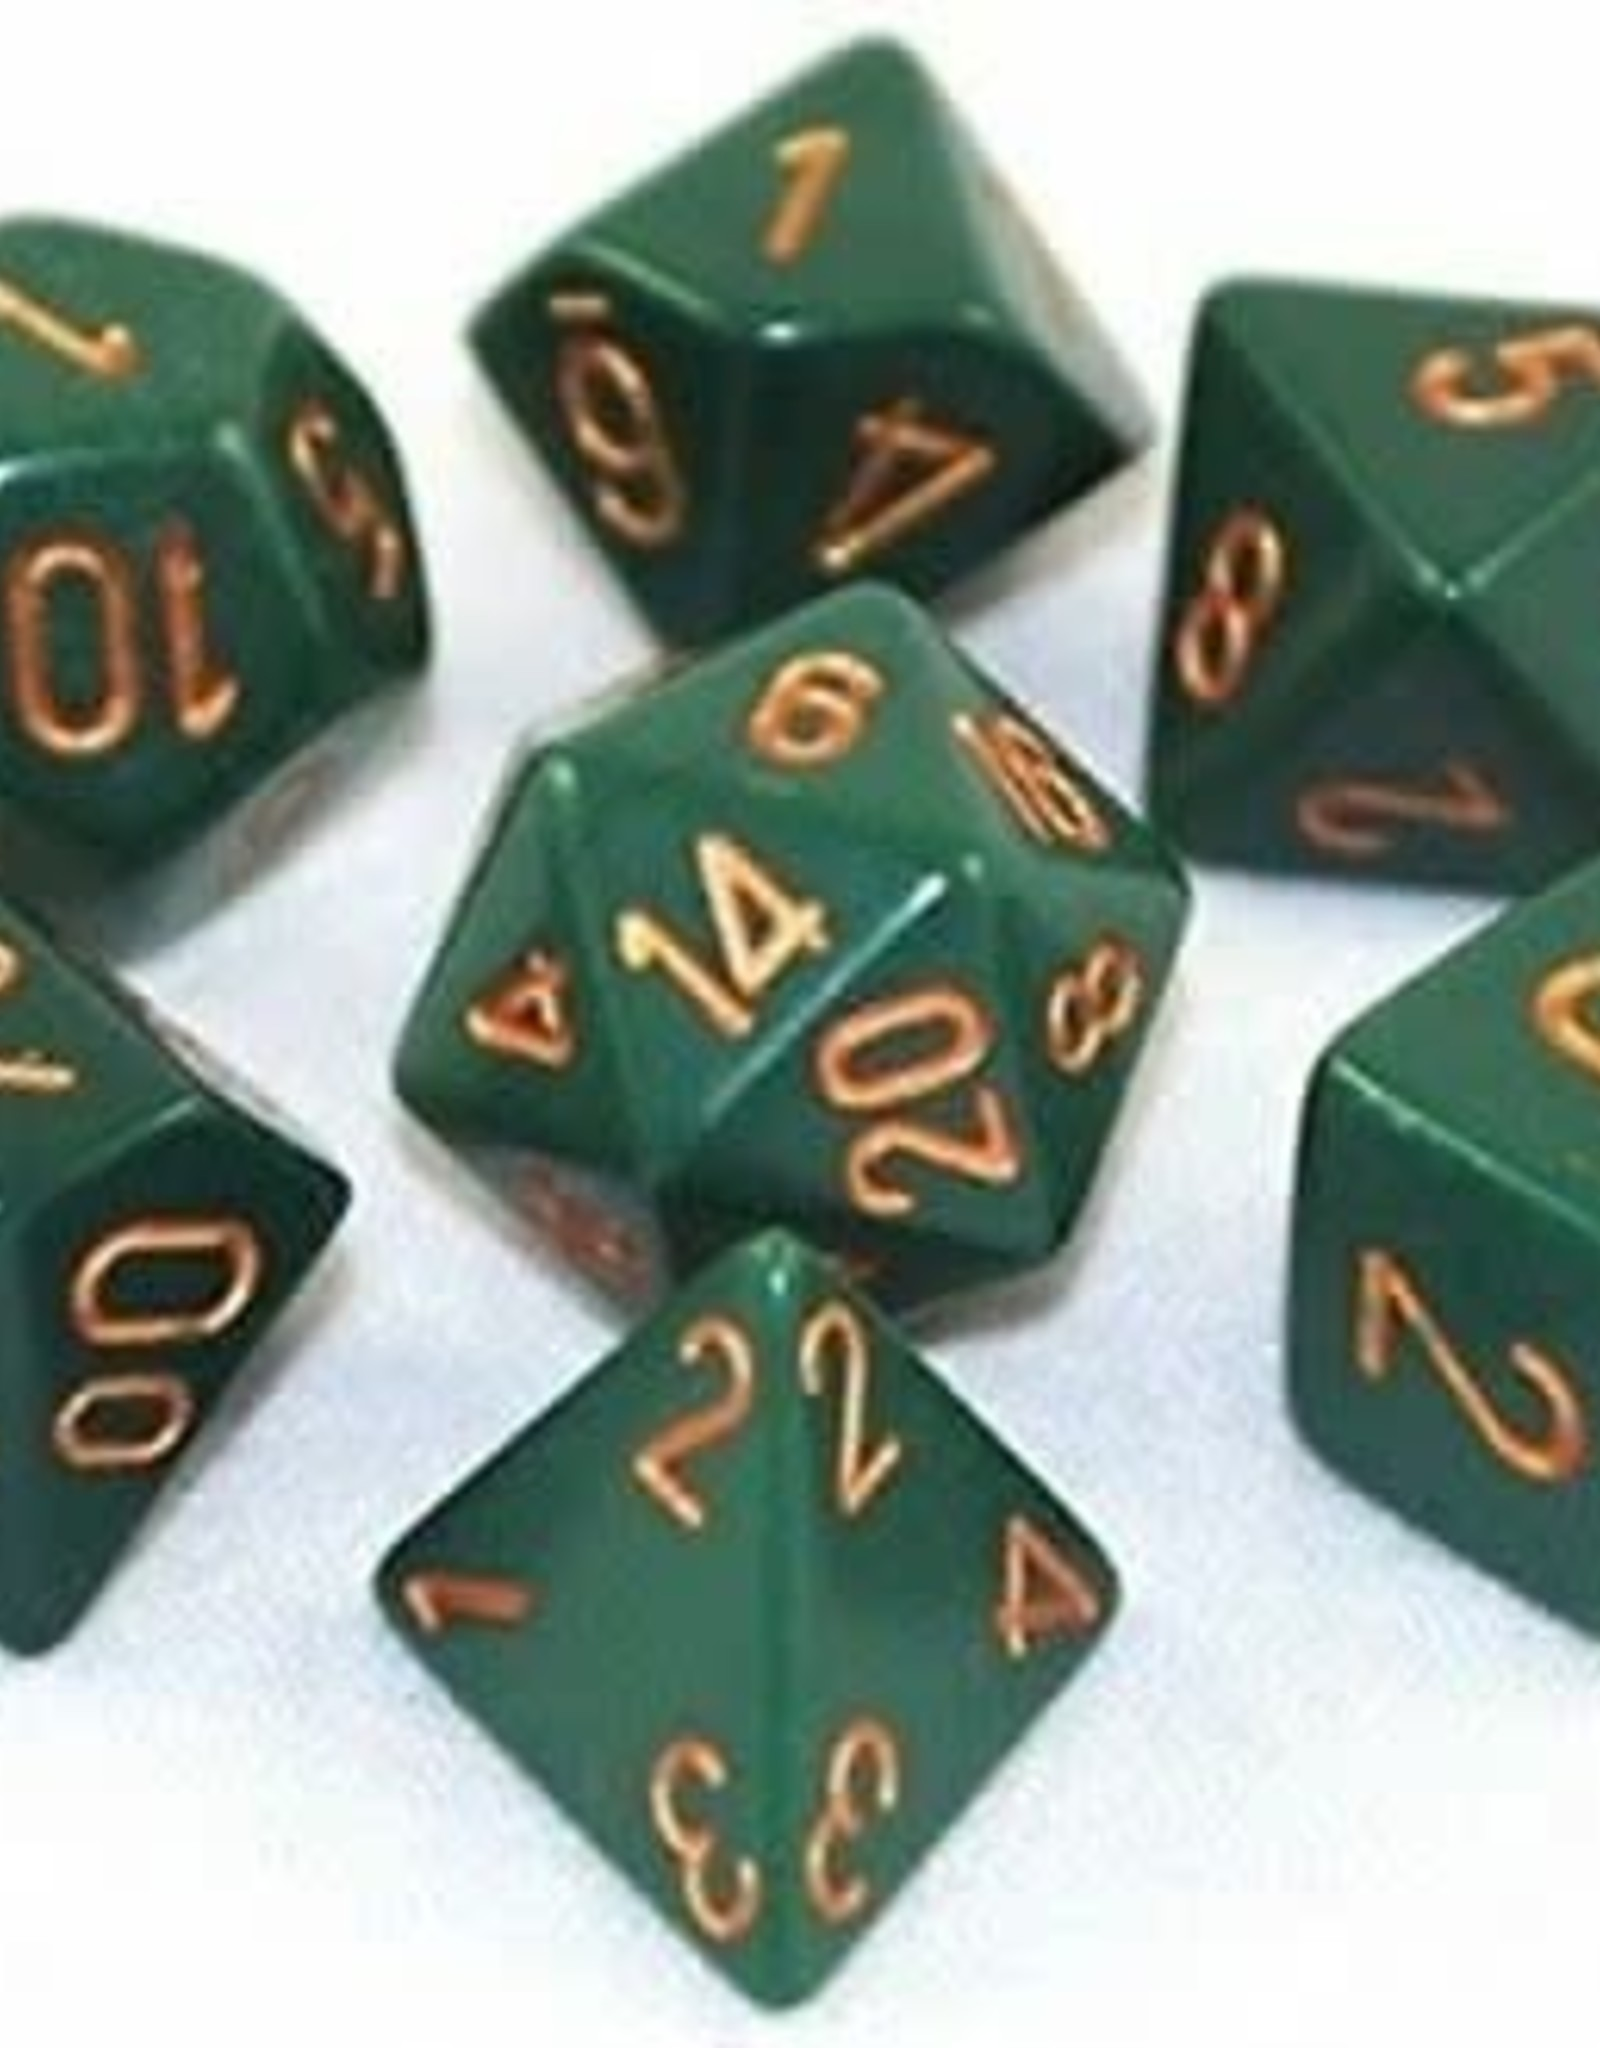 Chessex Dice Block 7ct. - Dusty Green/Copper